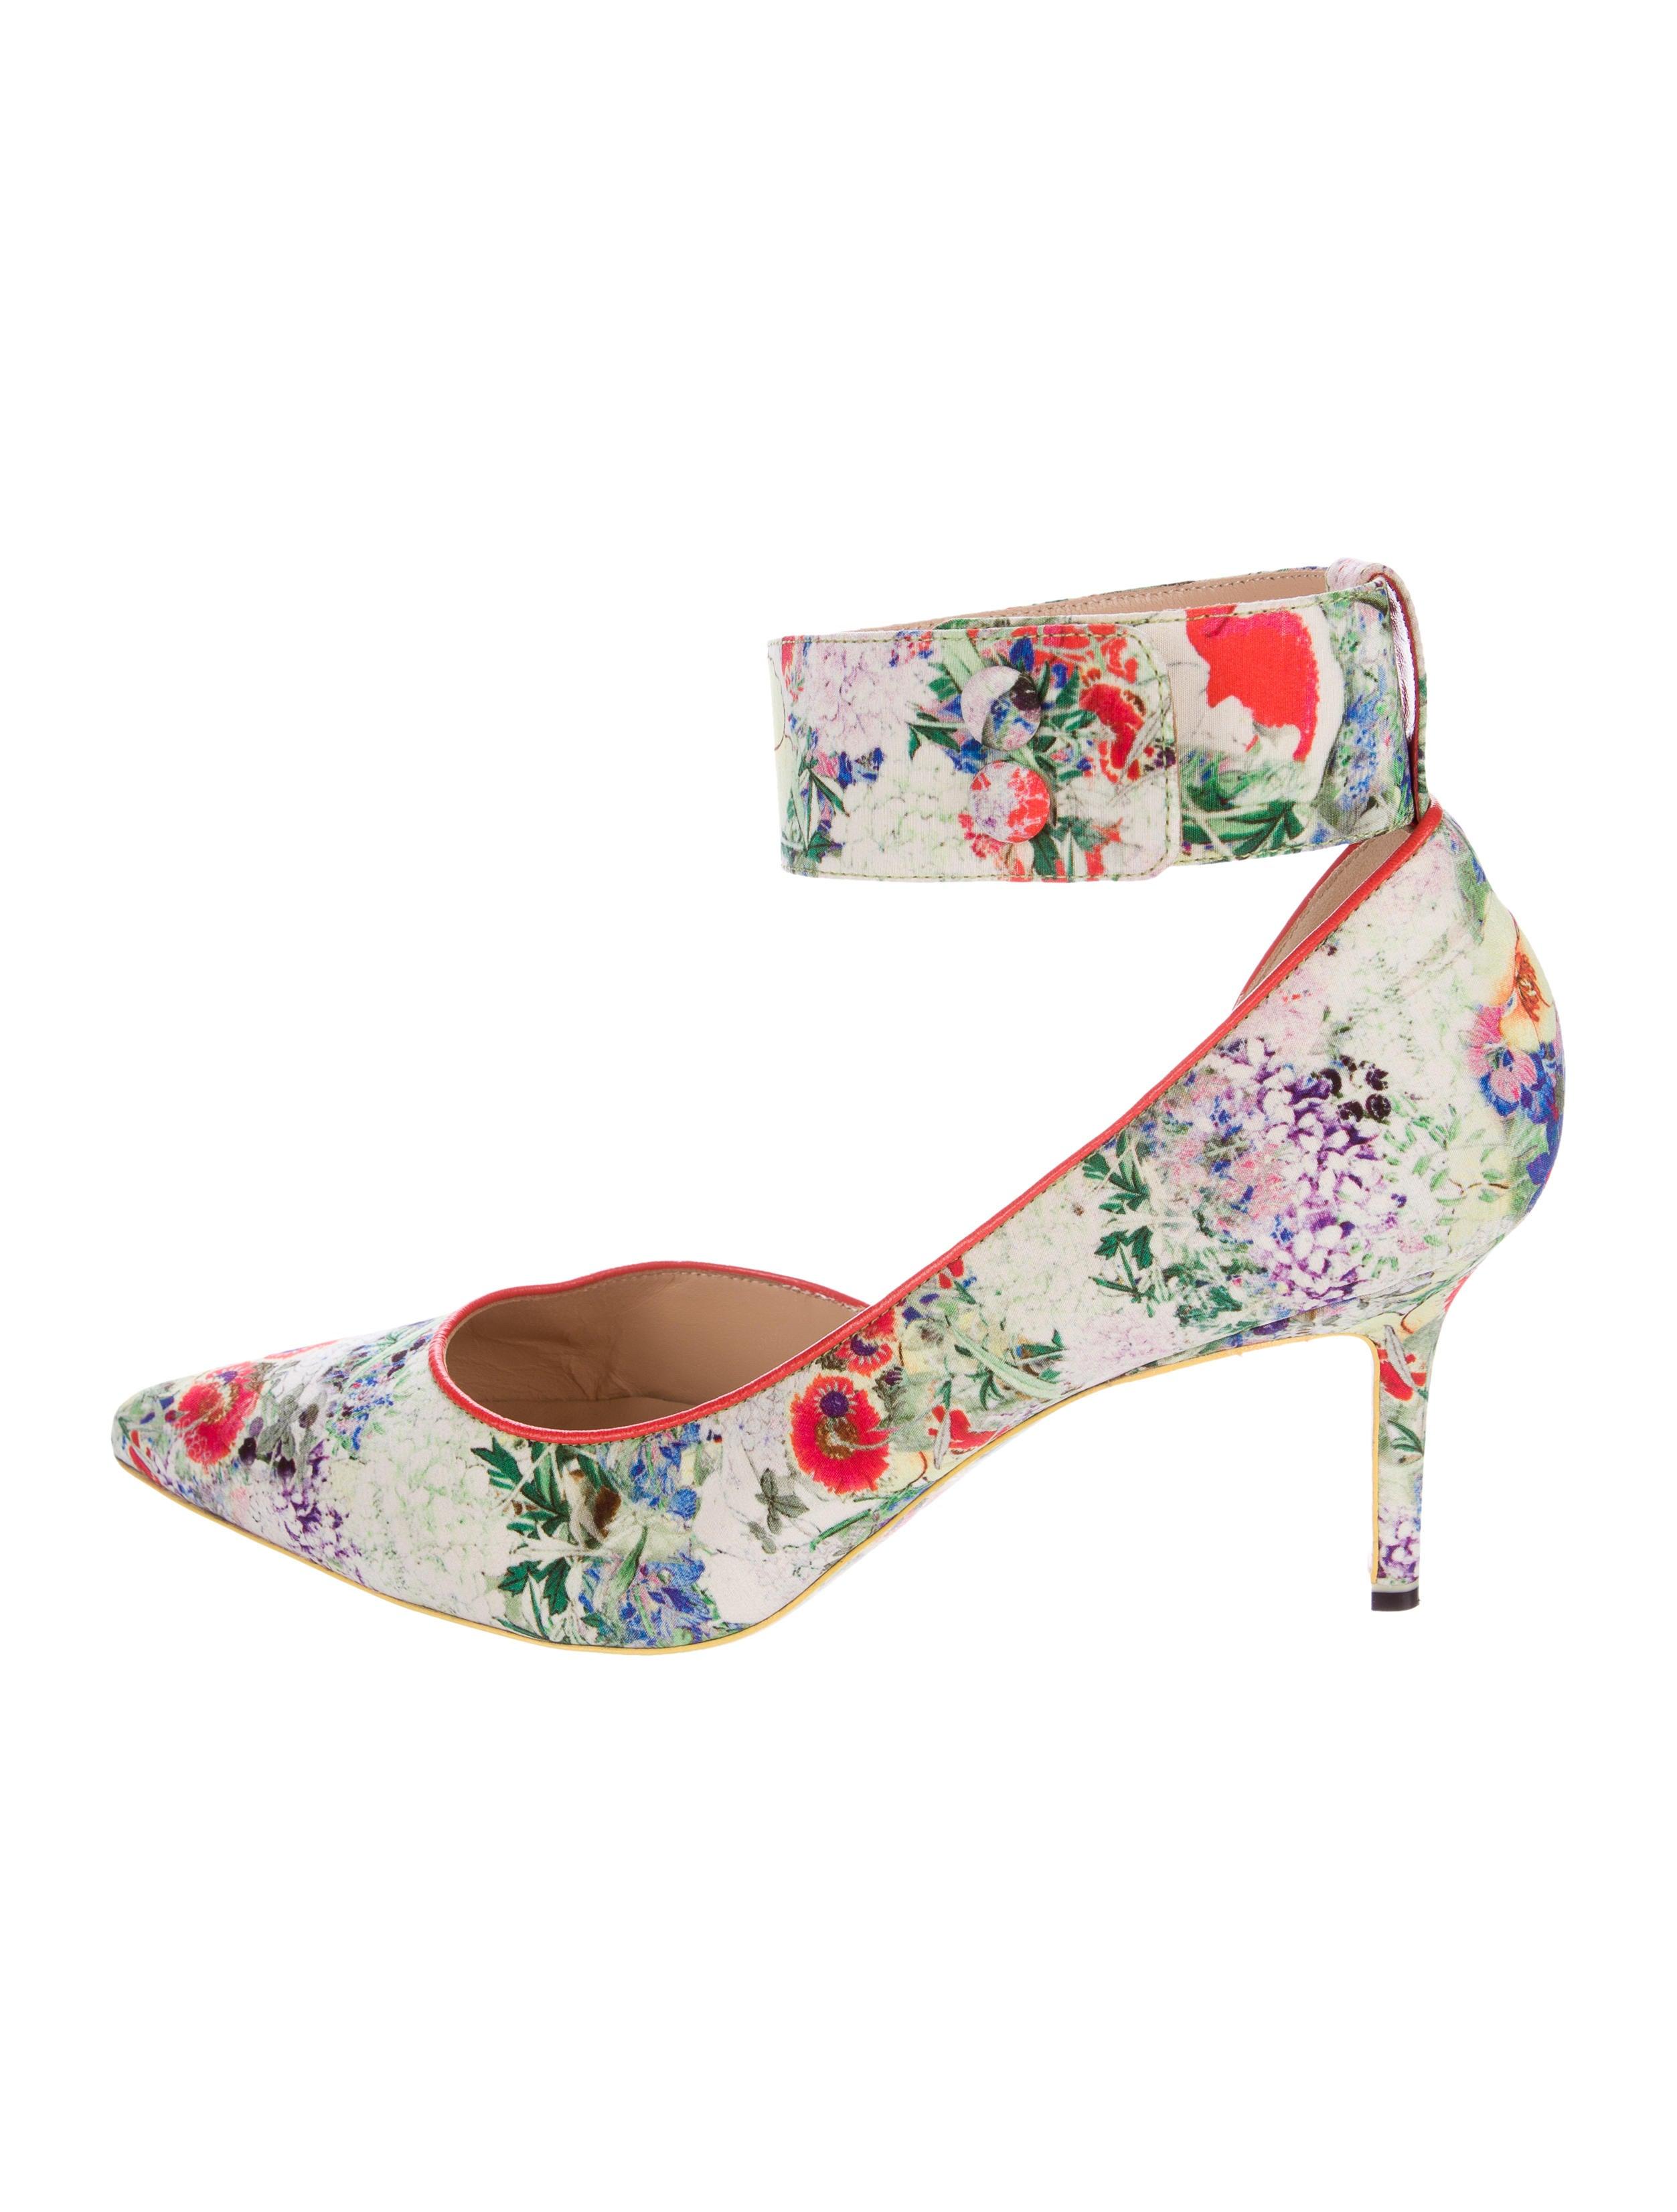 8feb1999ca95 Erdem x Nicholas Kirkwood Floral d Orsay Pumps - Shoes - WNKDS20012 ...